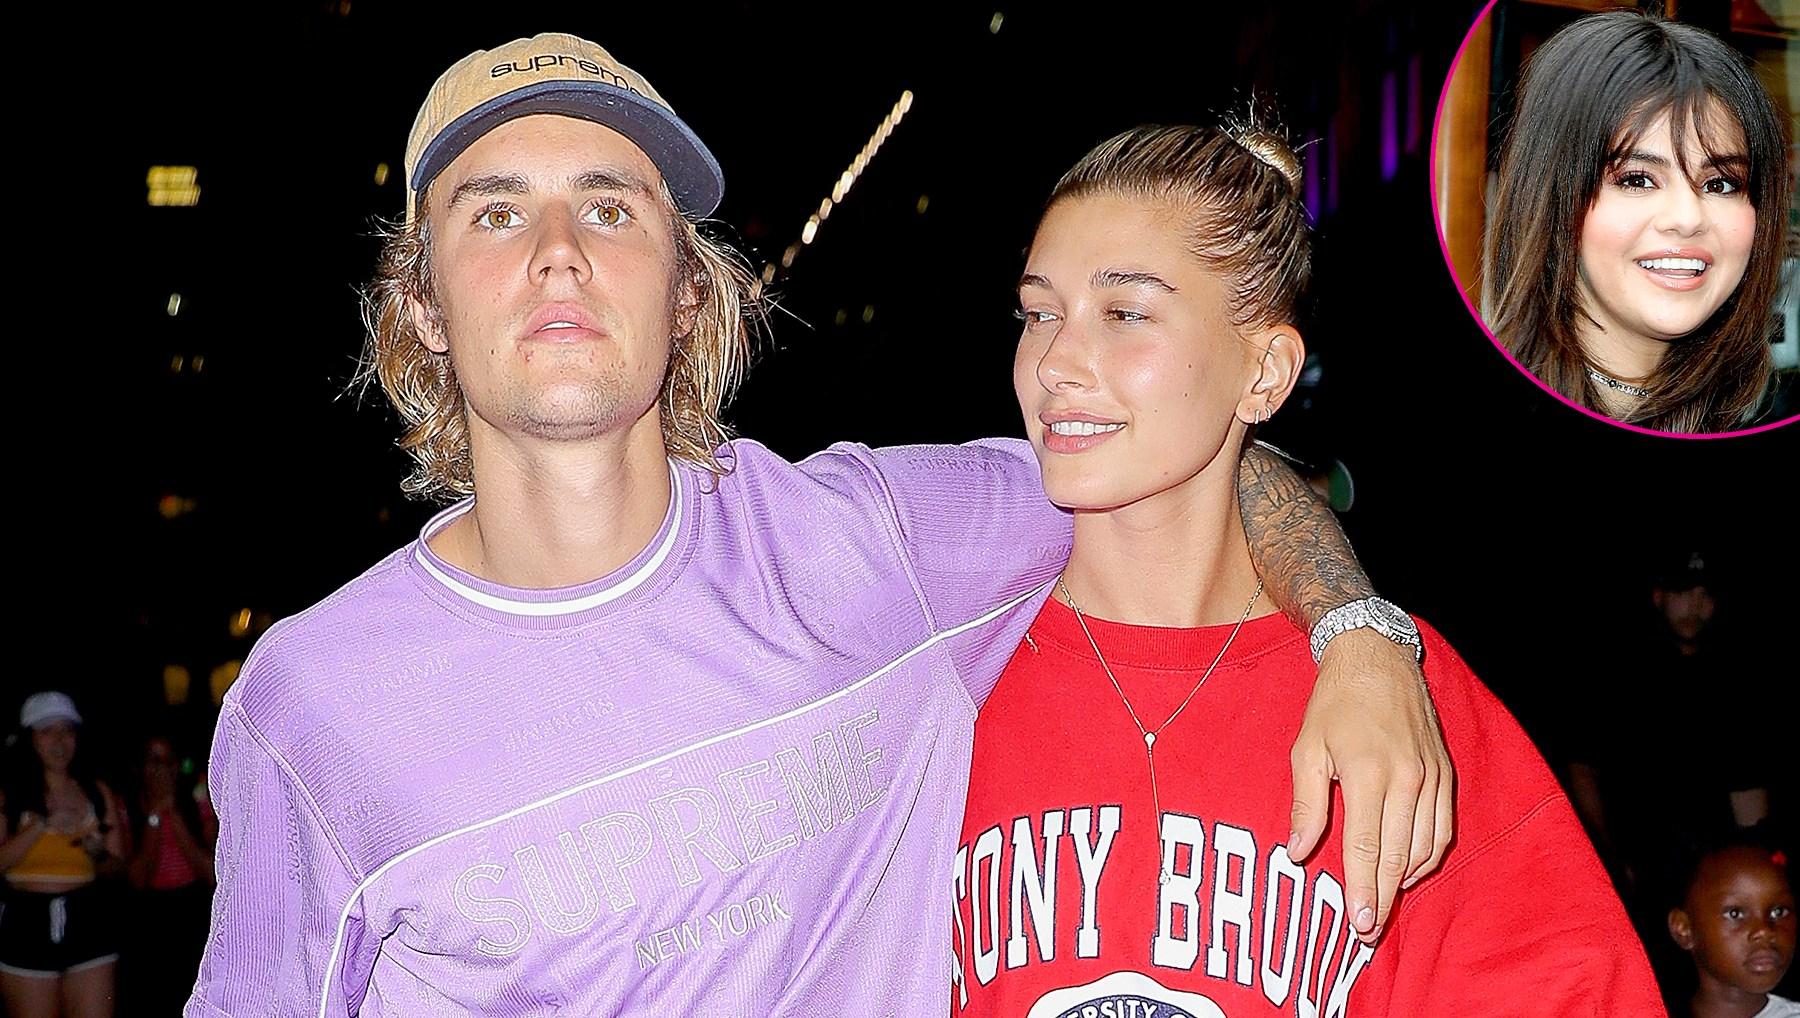 Justin-Bieber-Hailey-Baldwin-Selena-Gomez